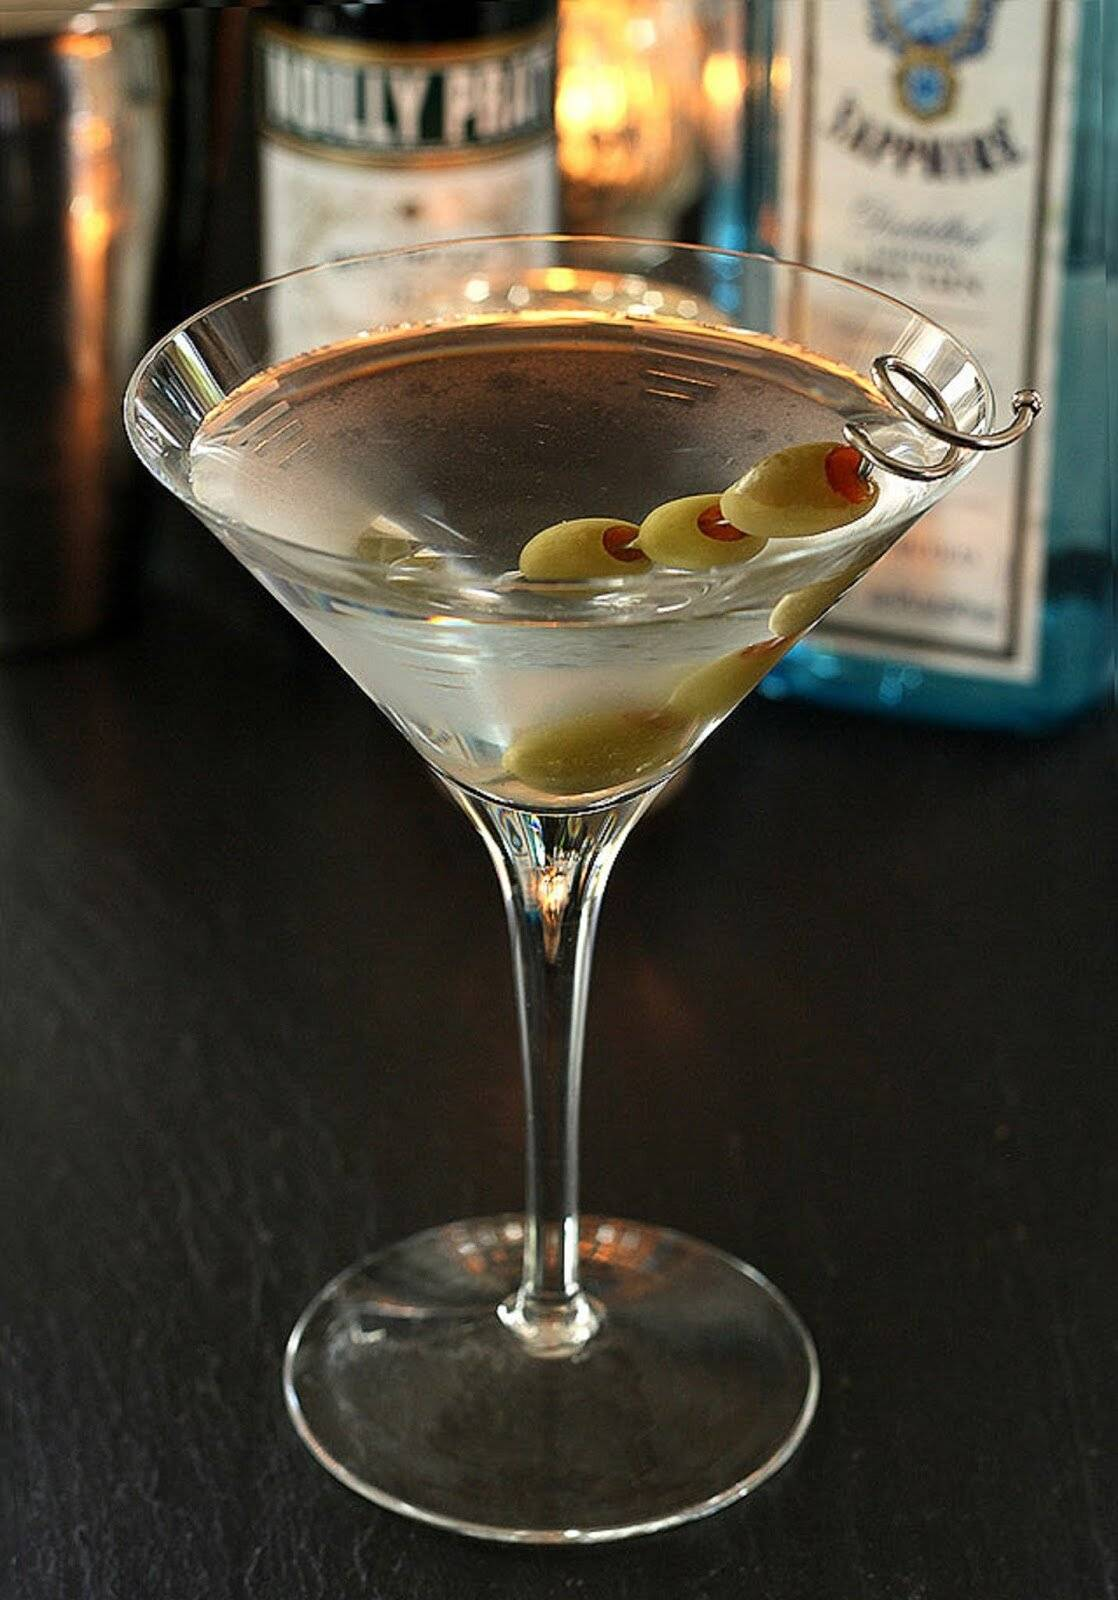 Зачем в мартини кладут оливку